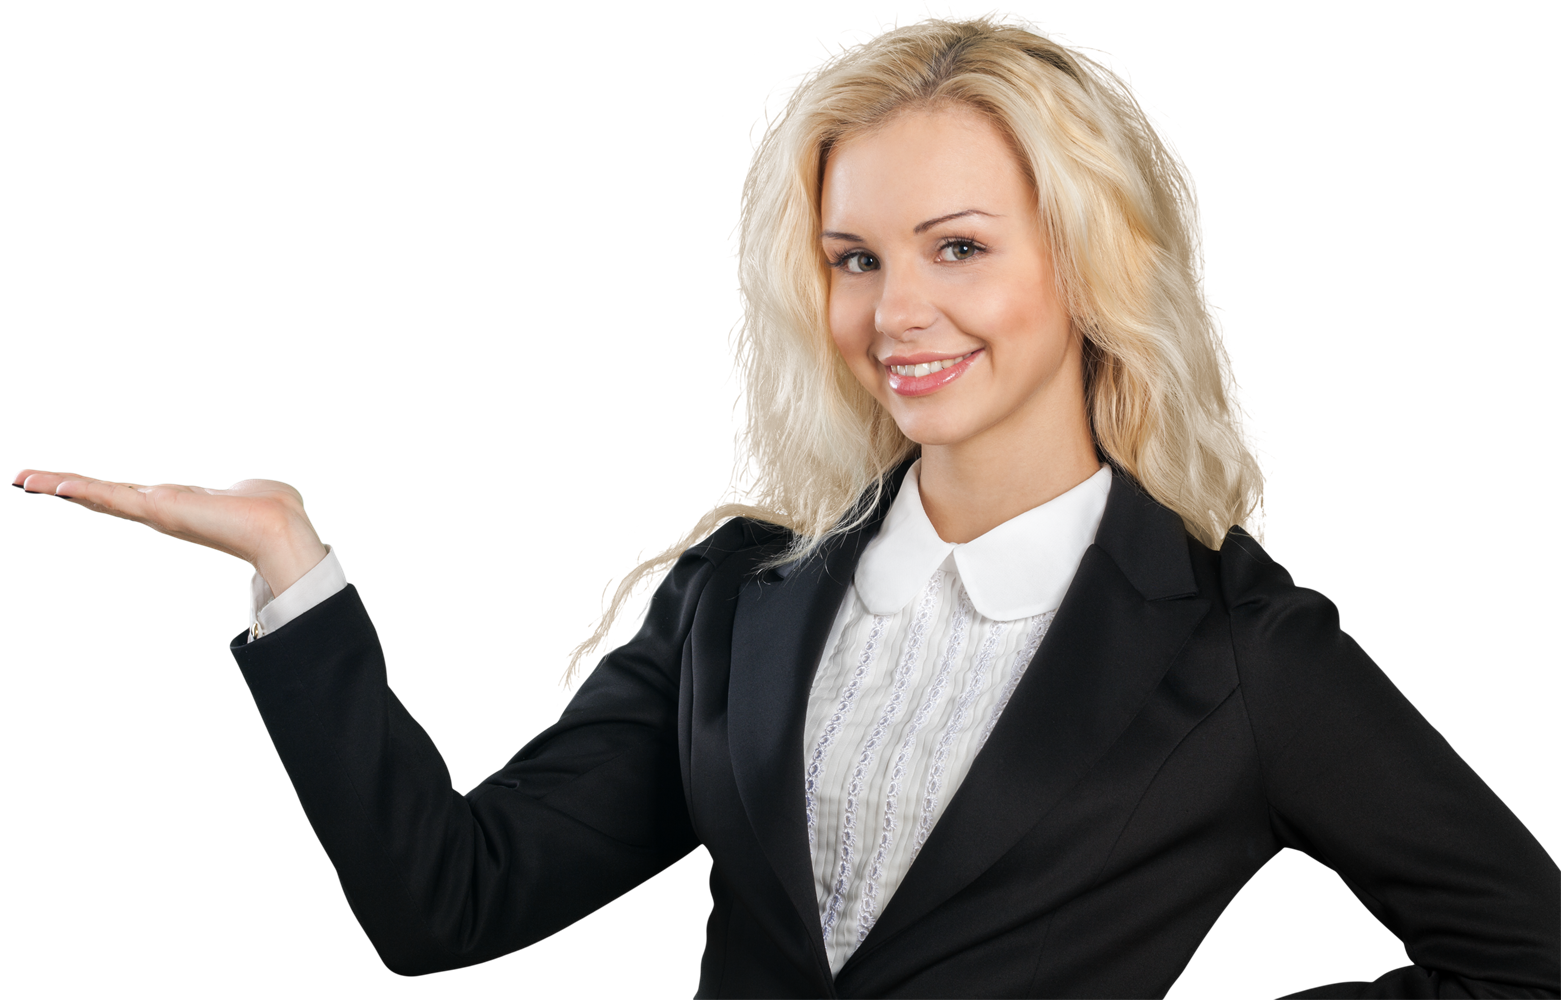 blonde-business-woman-website-design